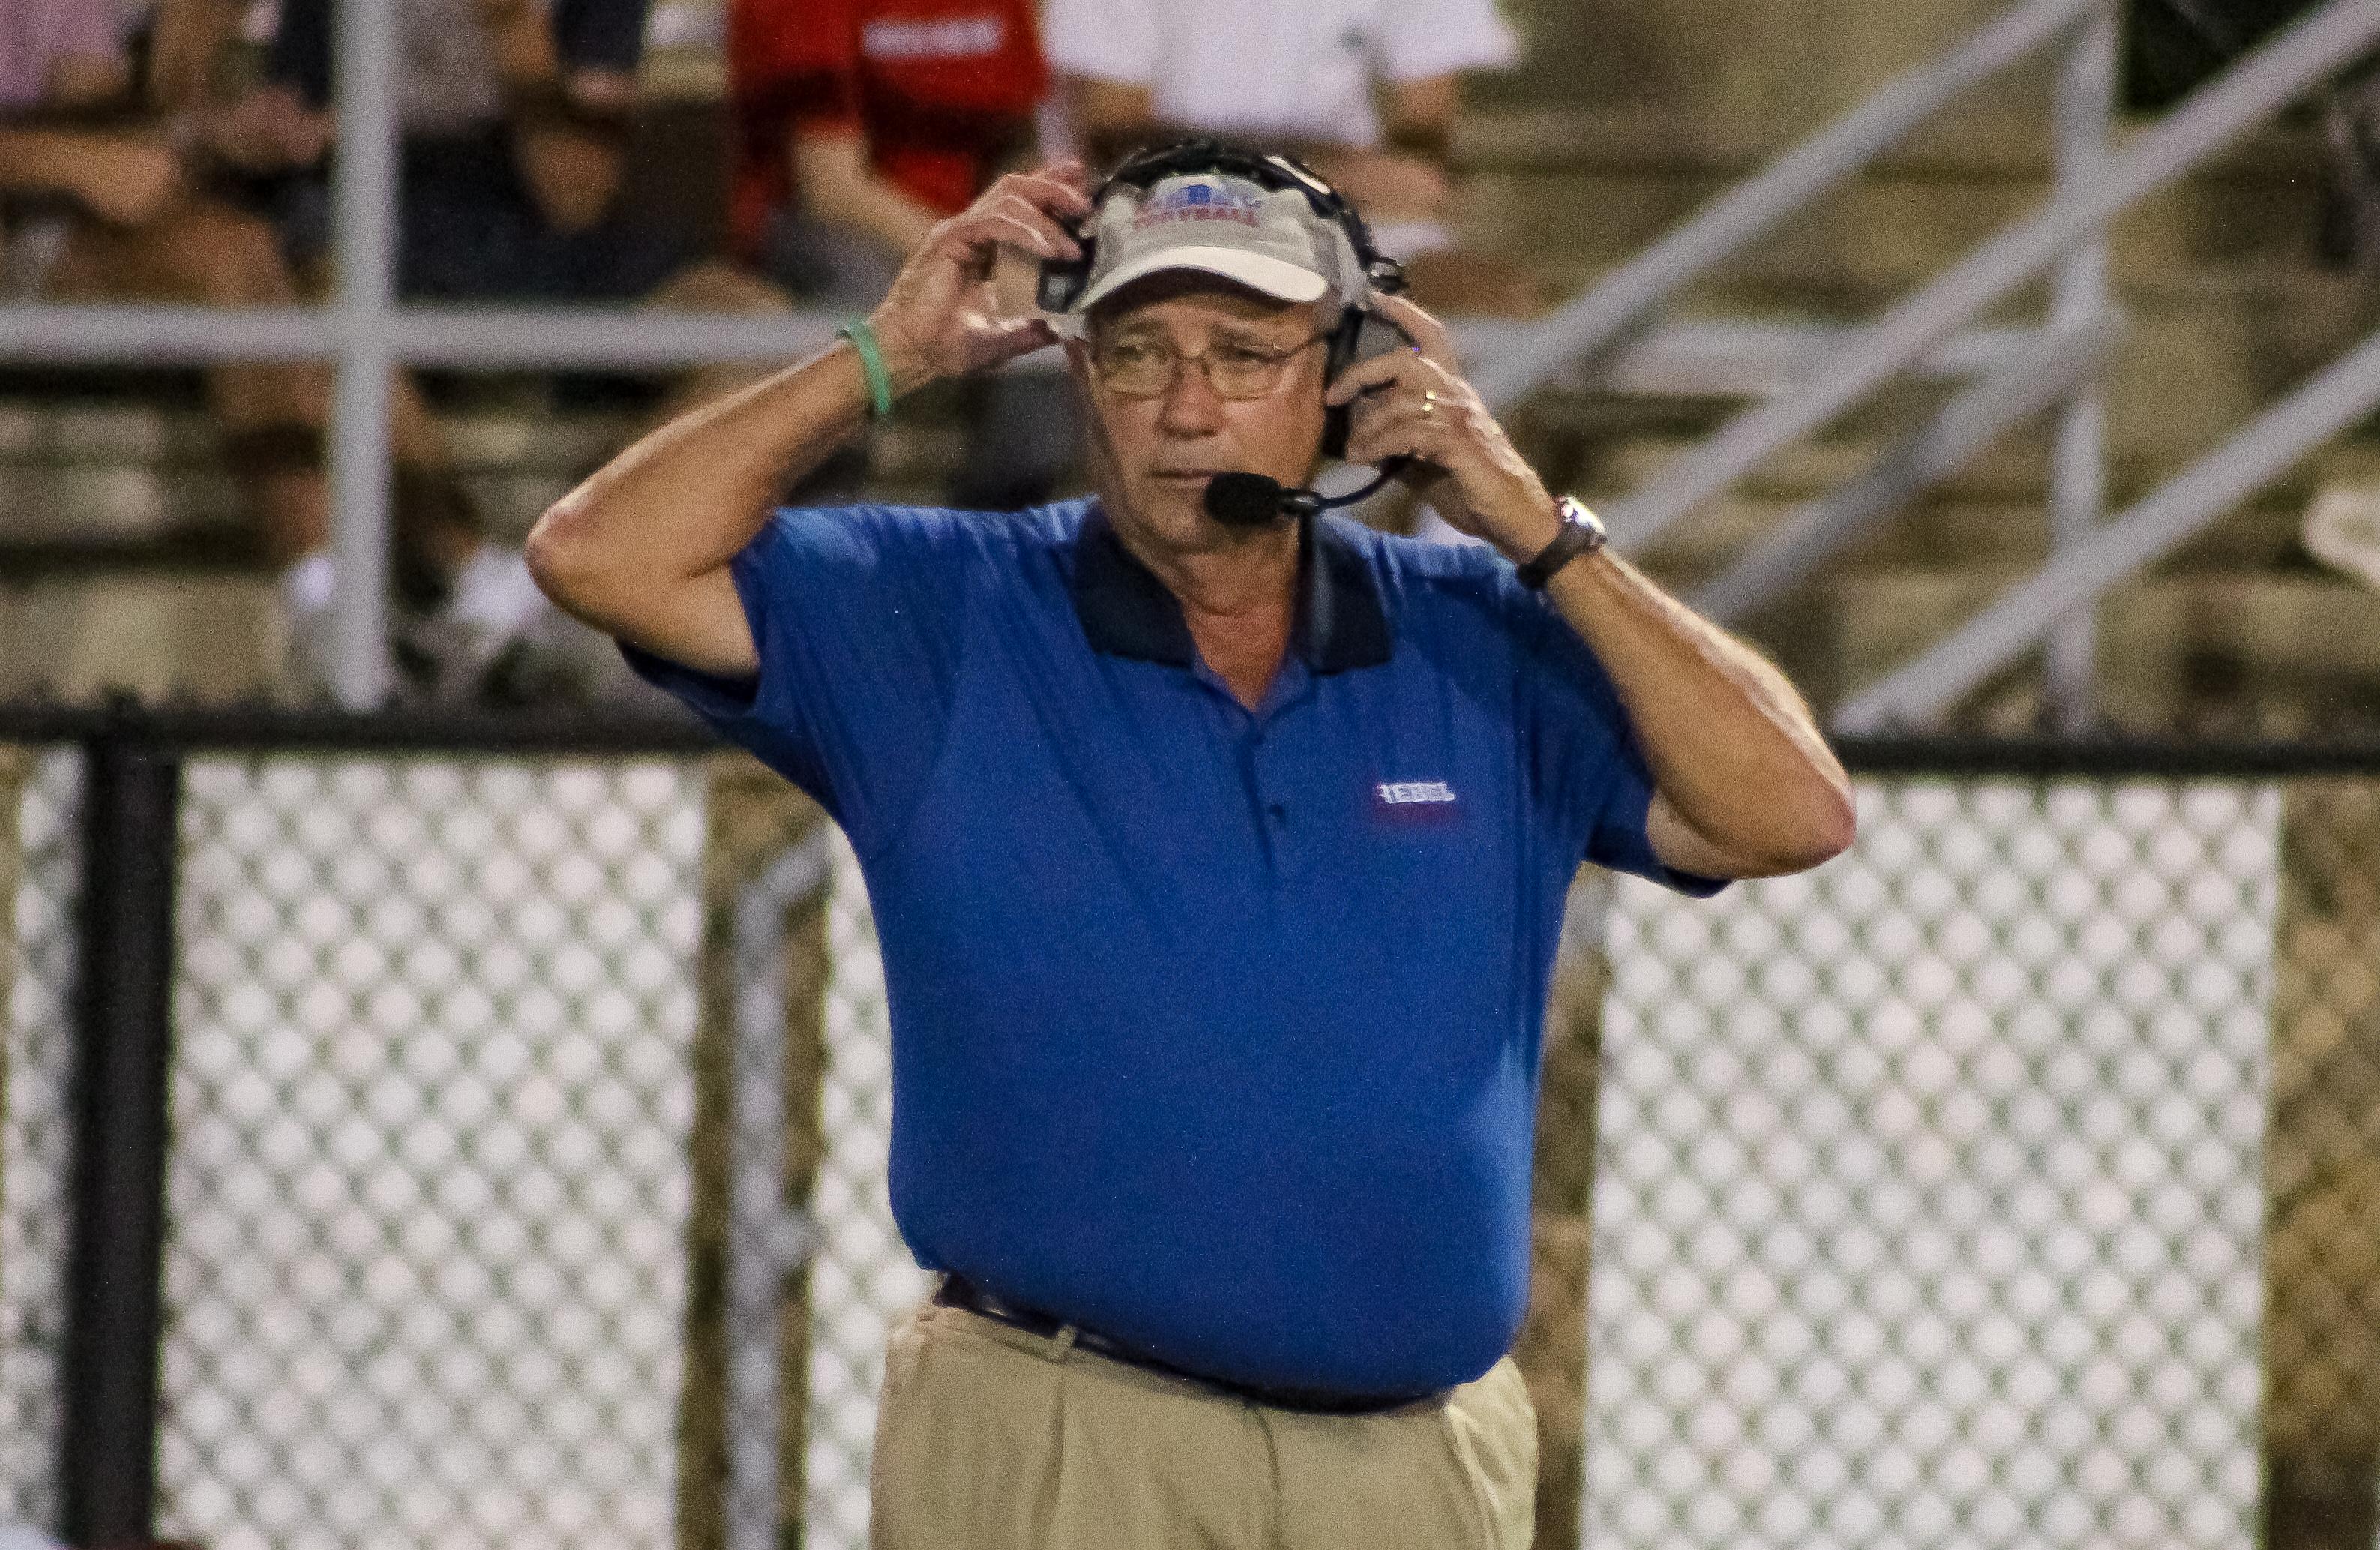 Vestavia Hills head coach Buddy Anderson